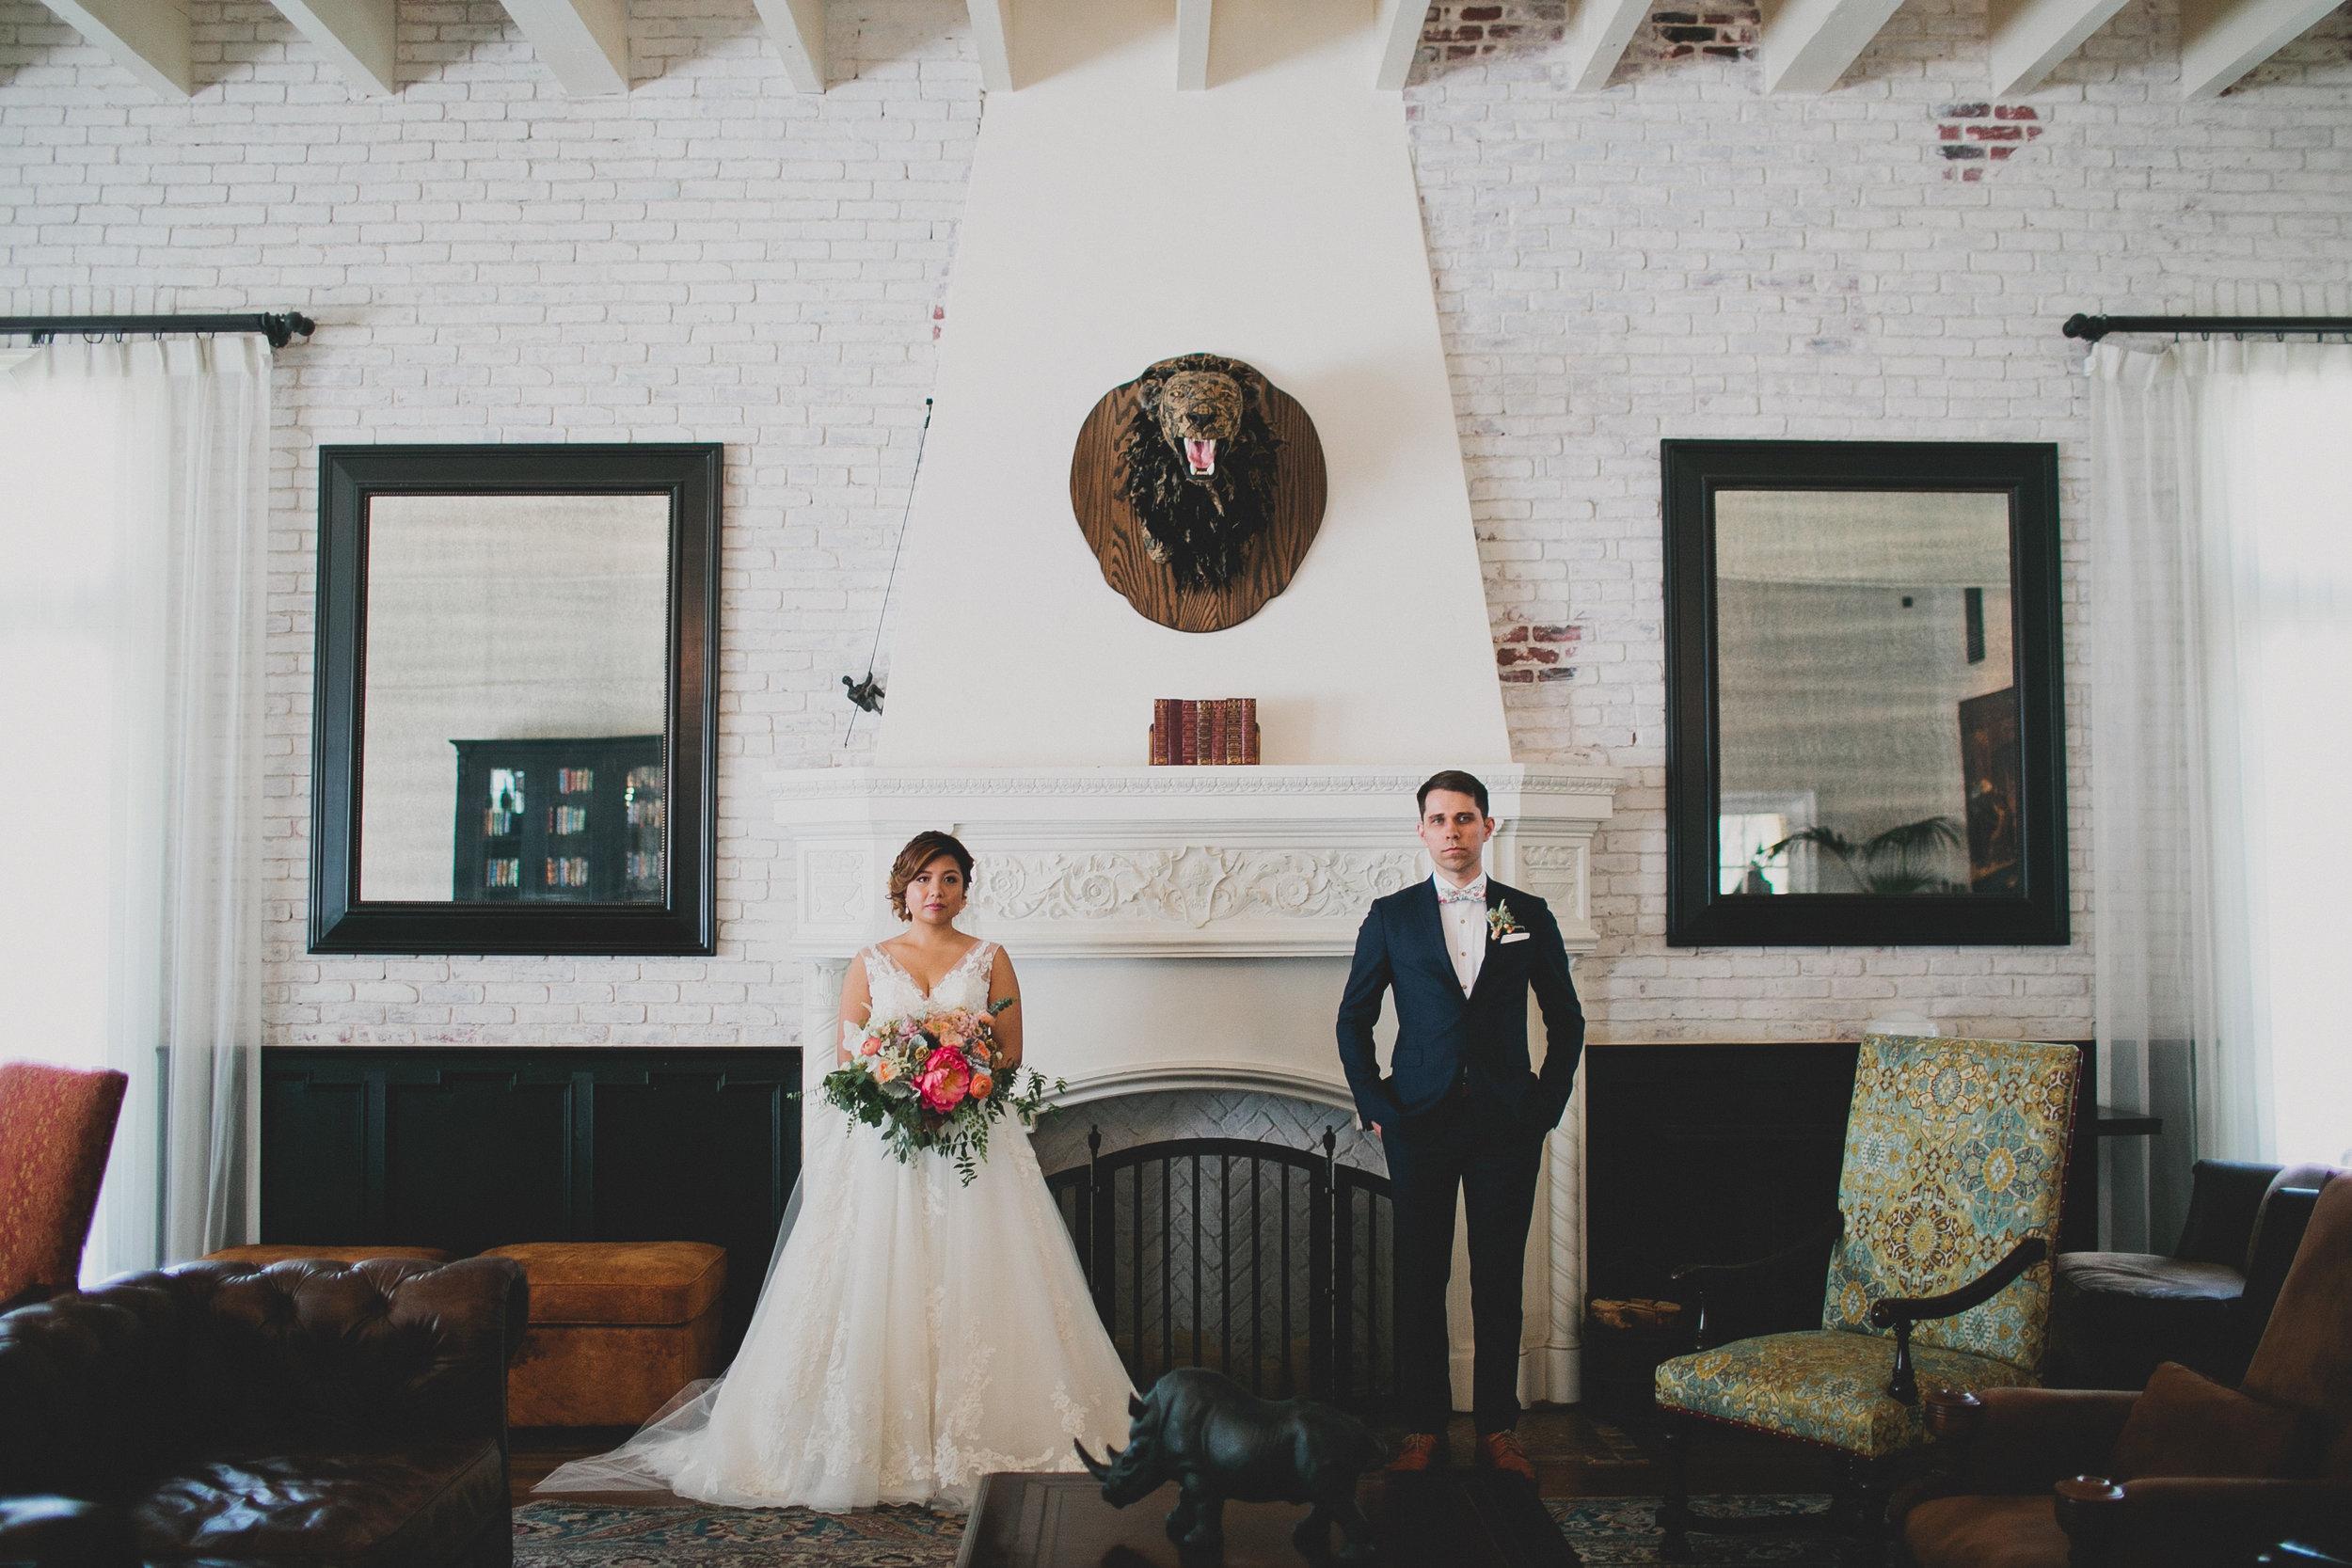 TiffanyAldis_Wedding_KatiePritchard-158.jpg